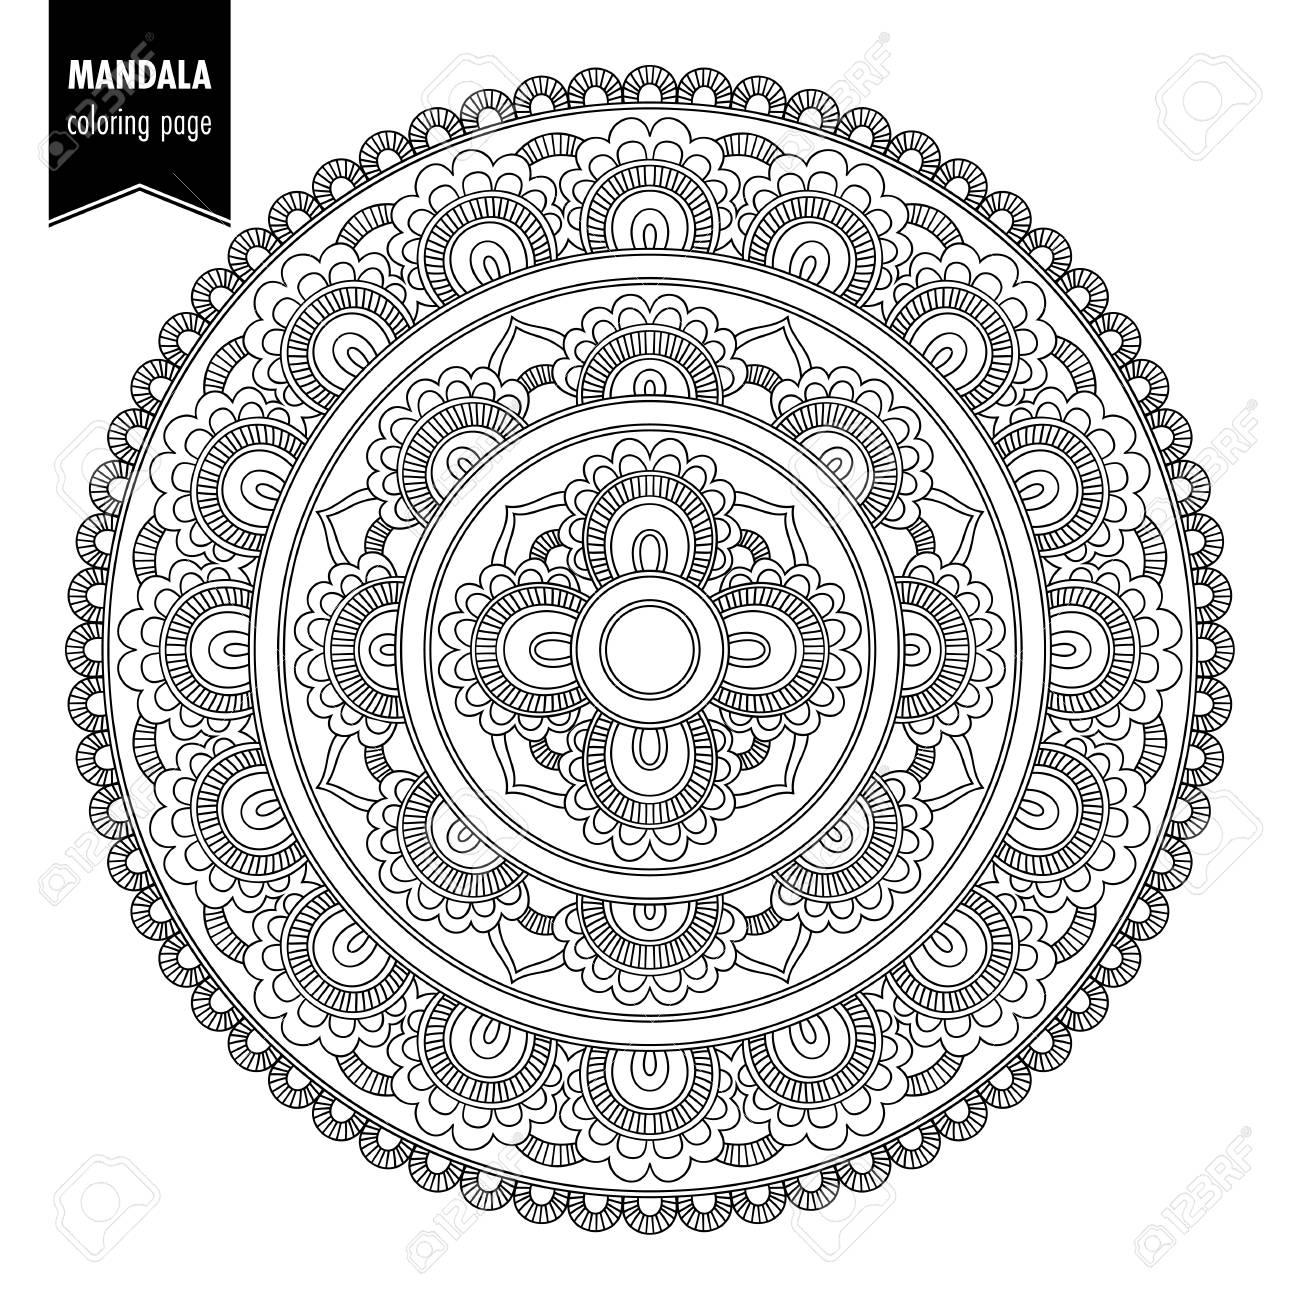 Monochrome Ethnic Mandala Design. Anti-stress Coloring Page For ...